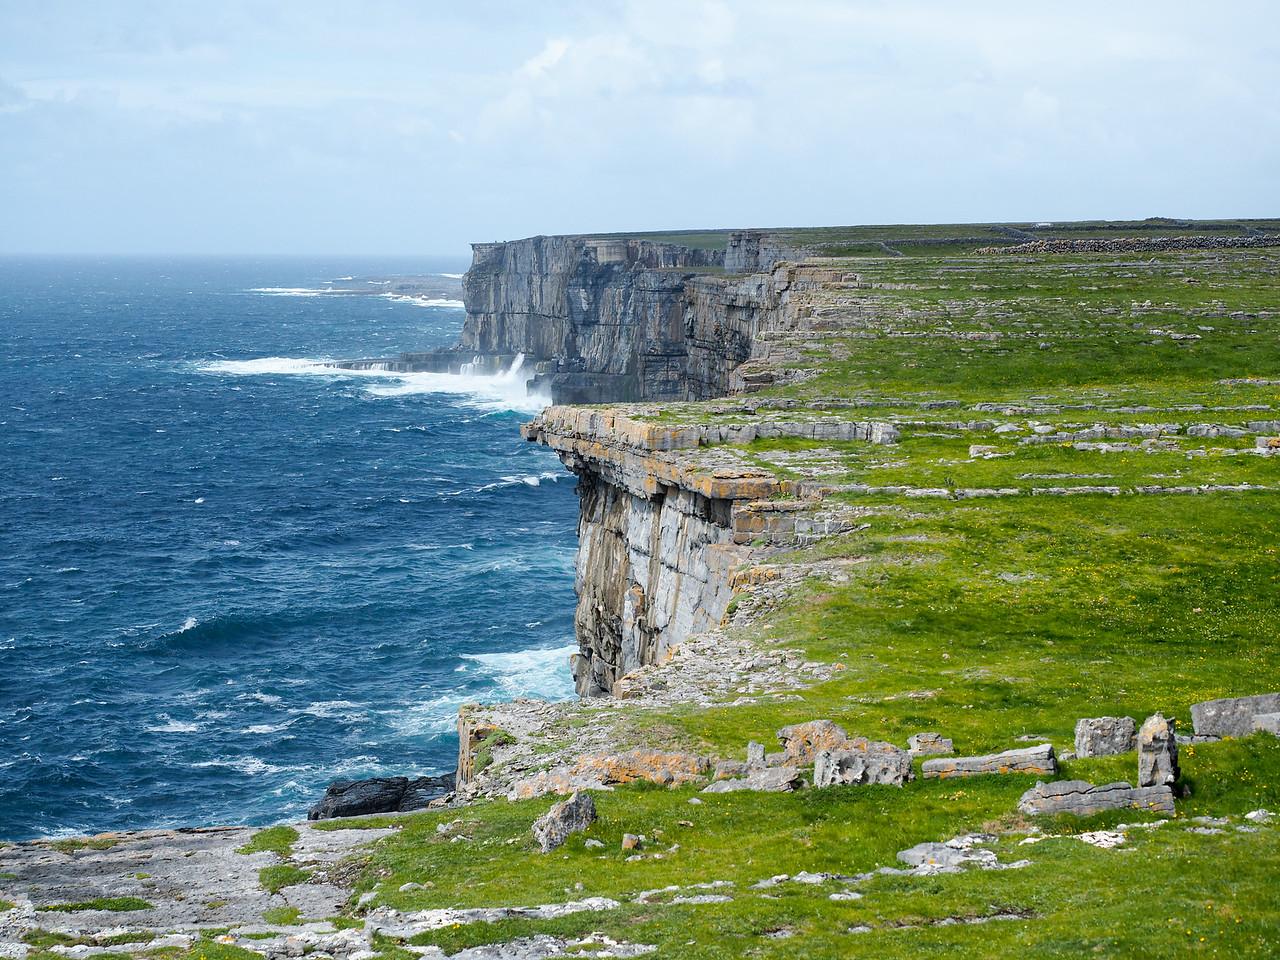 Sea cliffs of Inis Mor